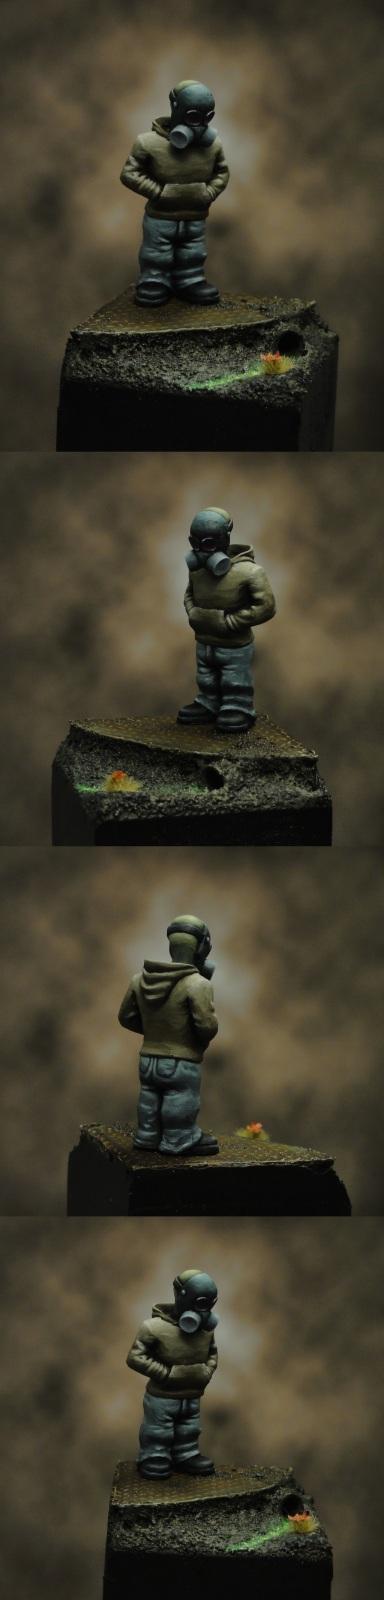 Toxic Spring, Painting Crusade IX exclusive figure